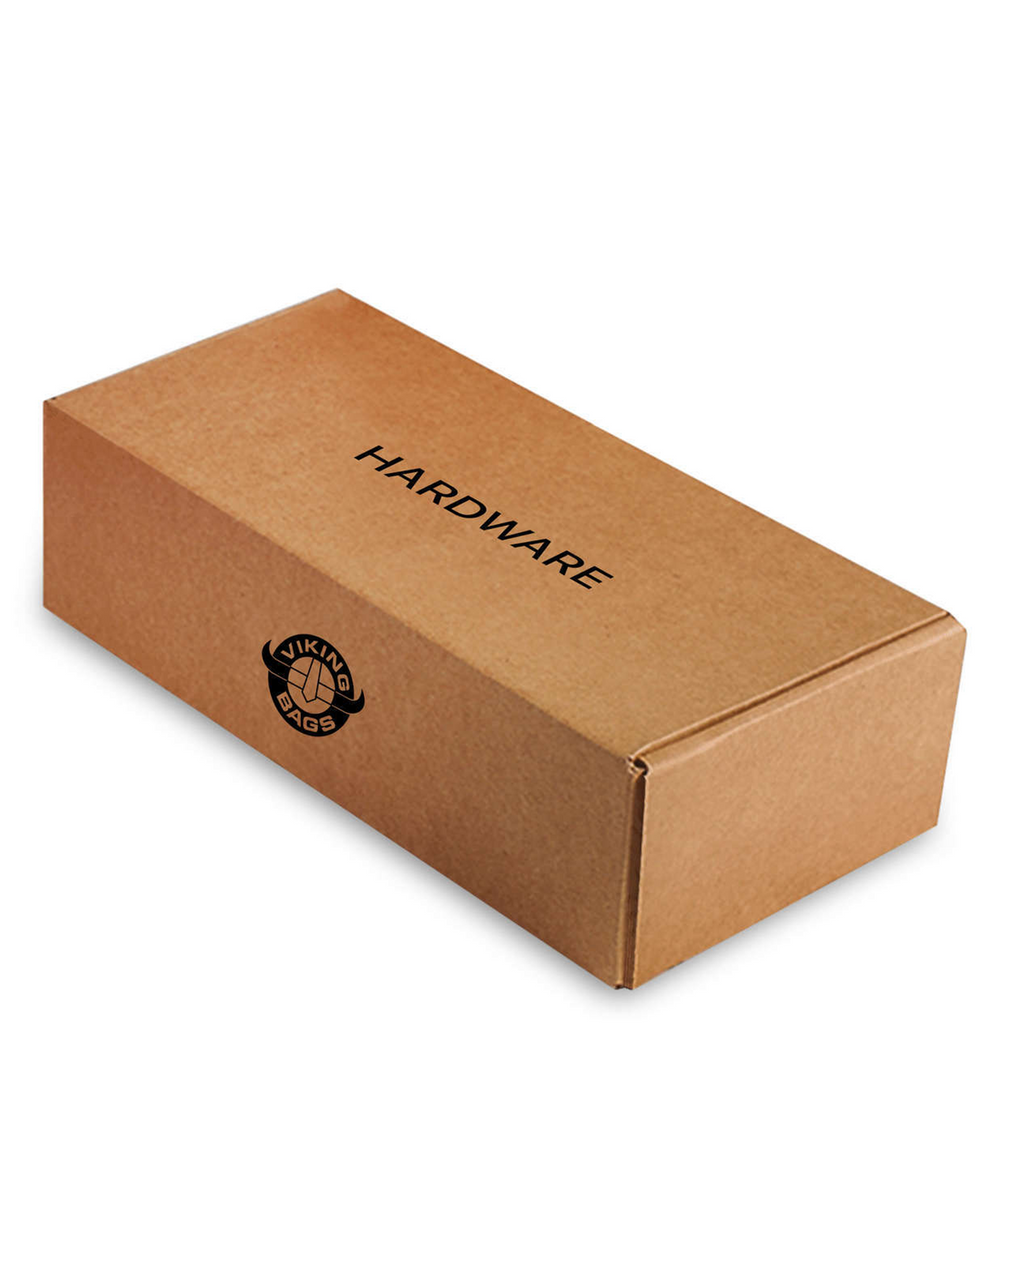 Kawasaki Vulcan S ABS Cafe Viking Lamellar Large Leather Covered Non-Shock Cutout Hard Saddlebags Hardware Box